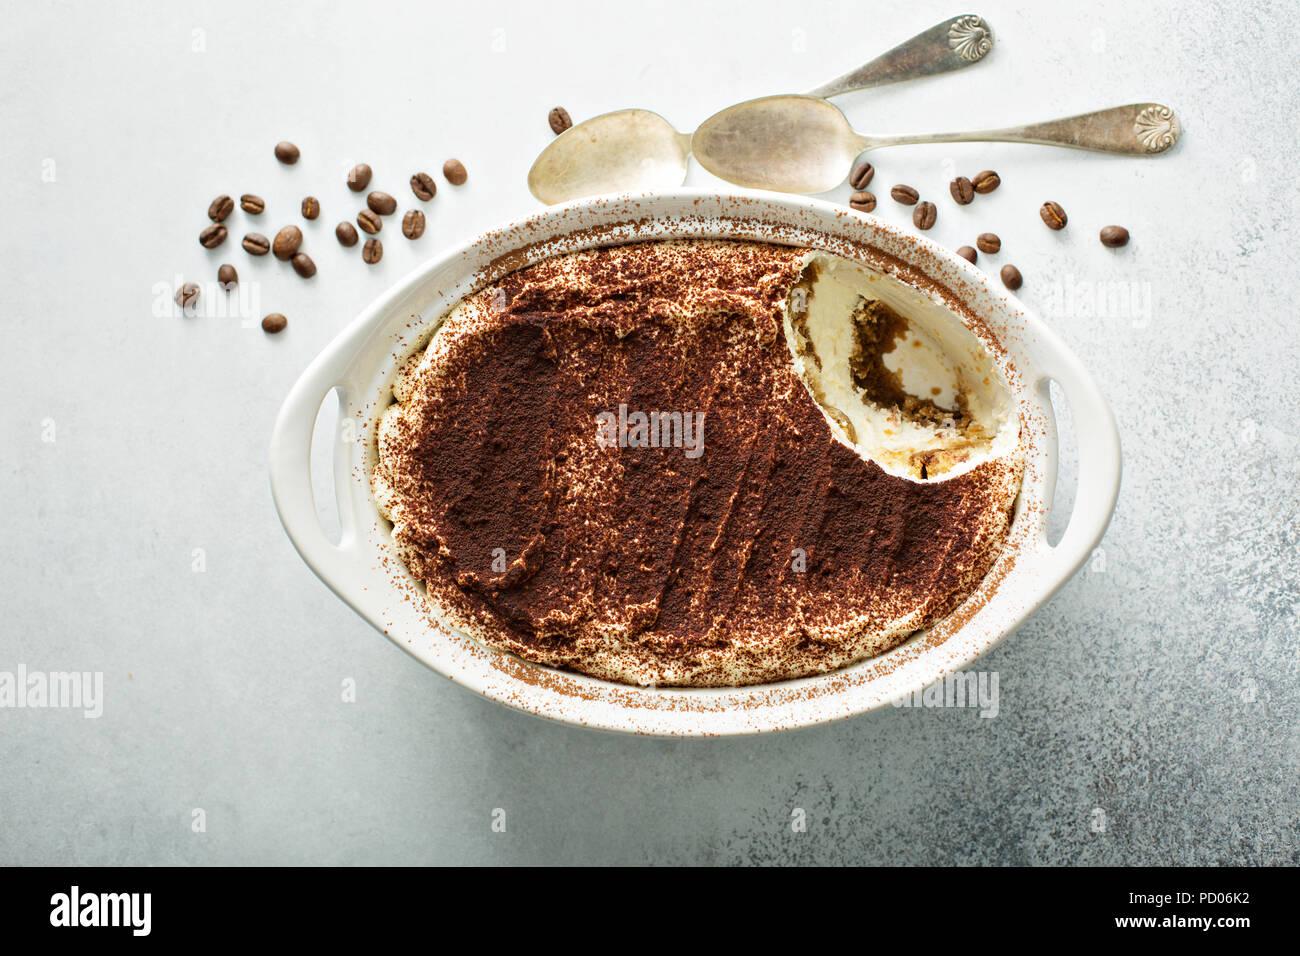 Tiramisu cake in a ceramic dish - Stock Image